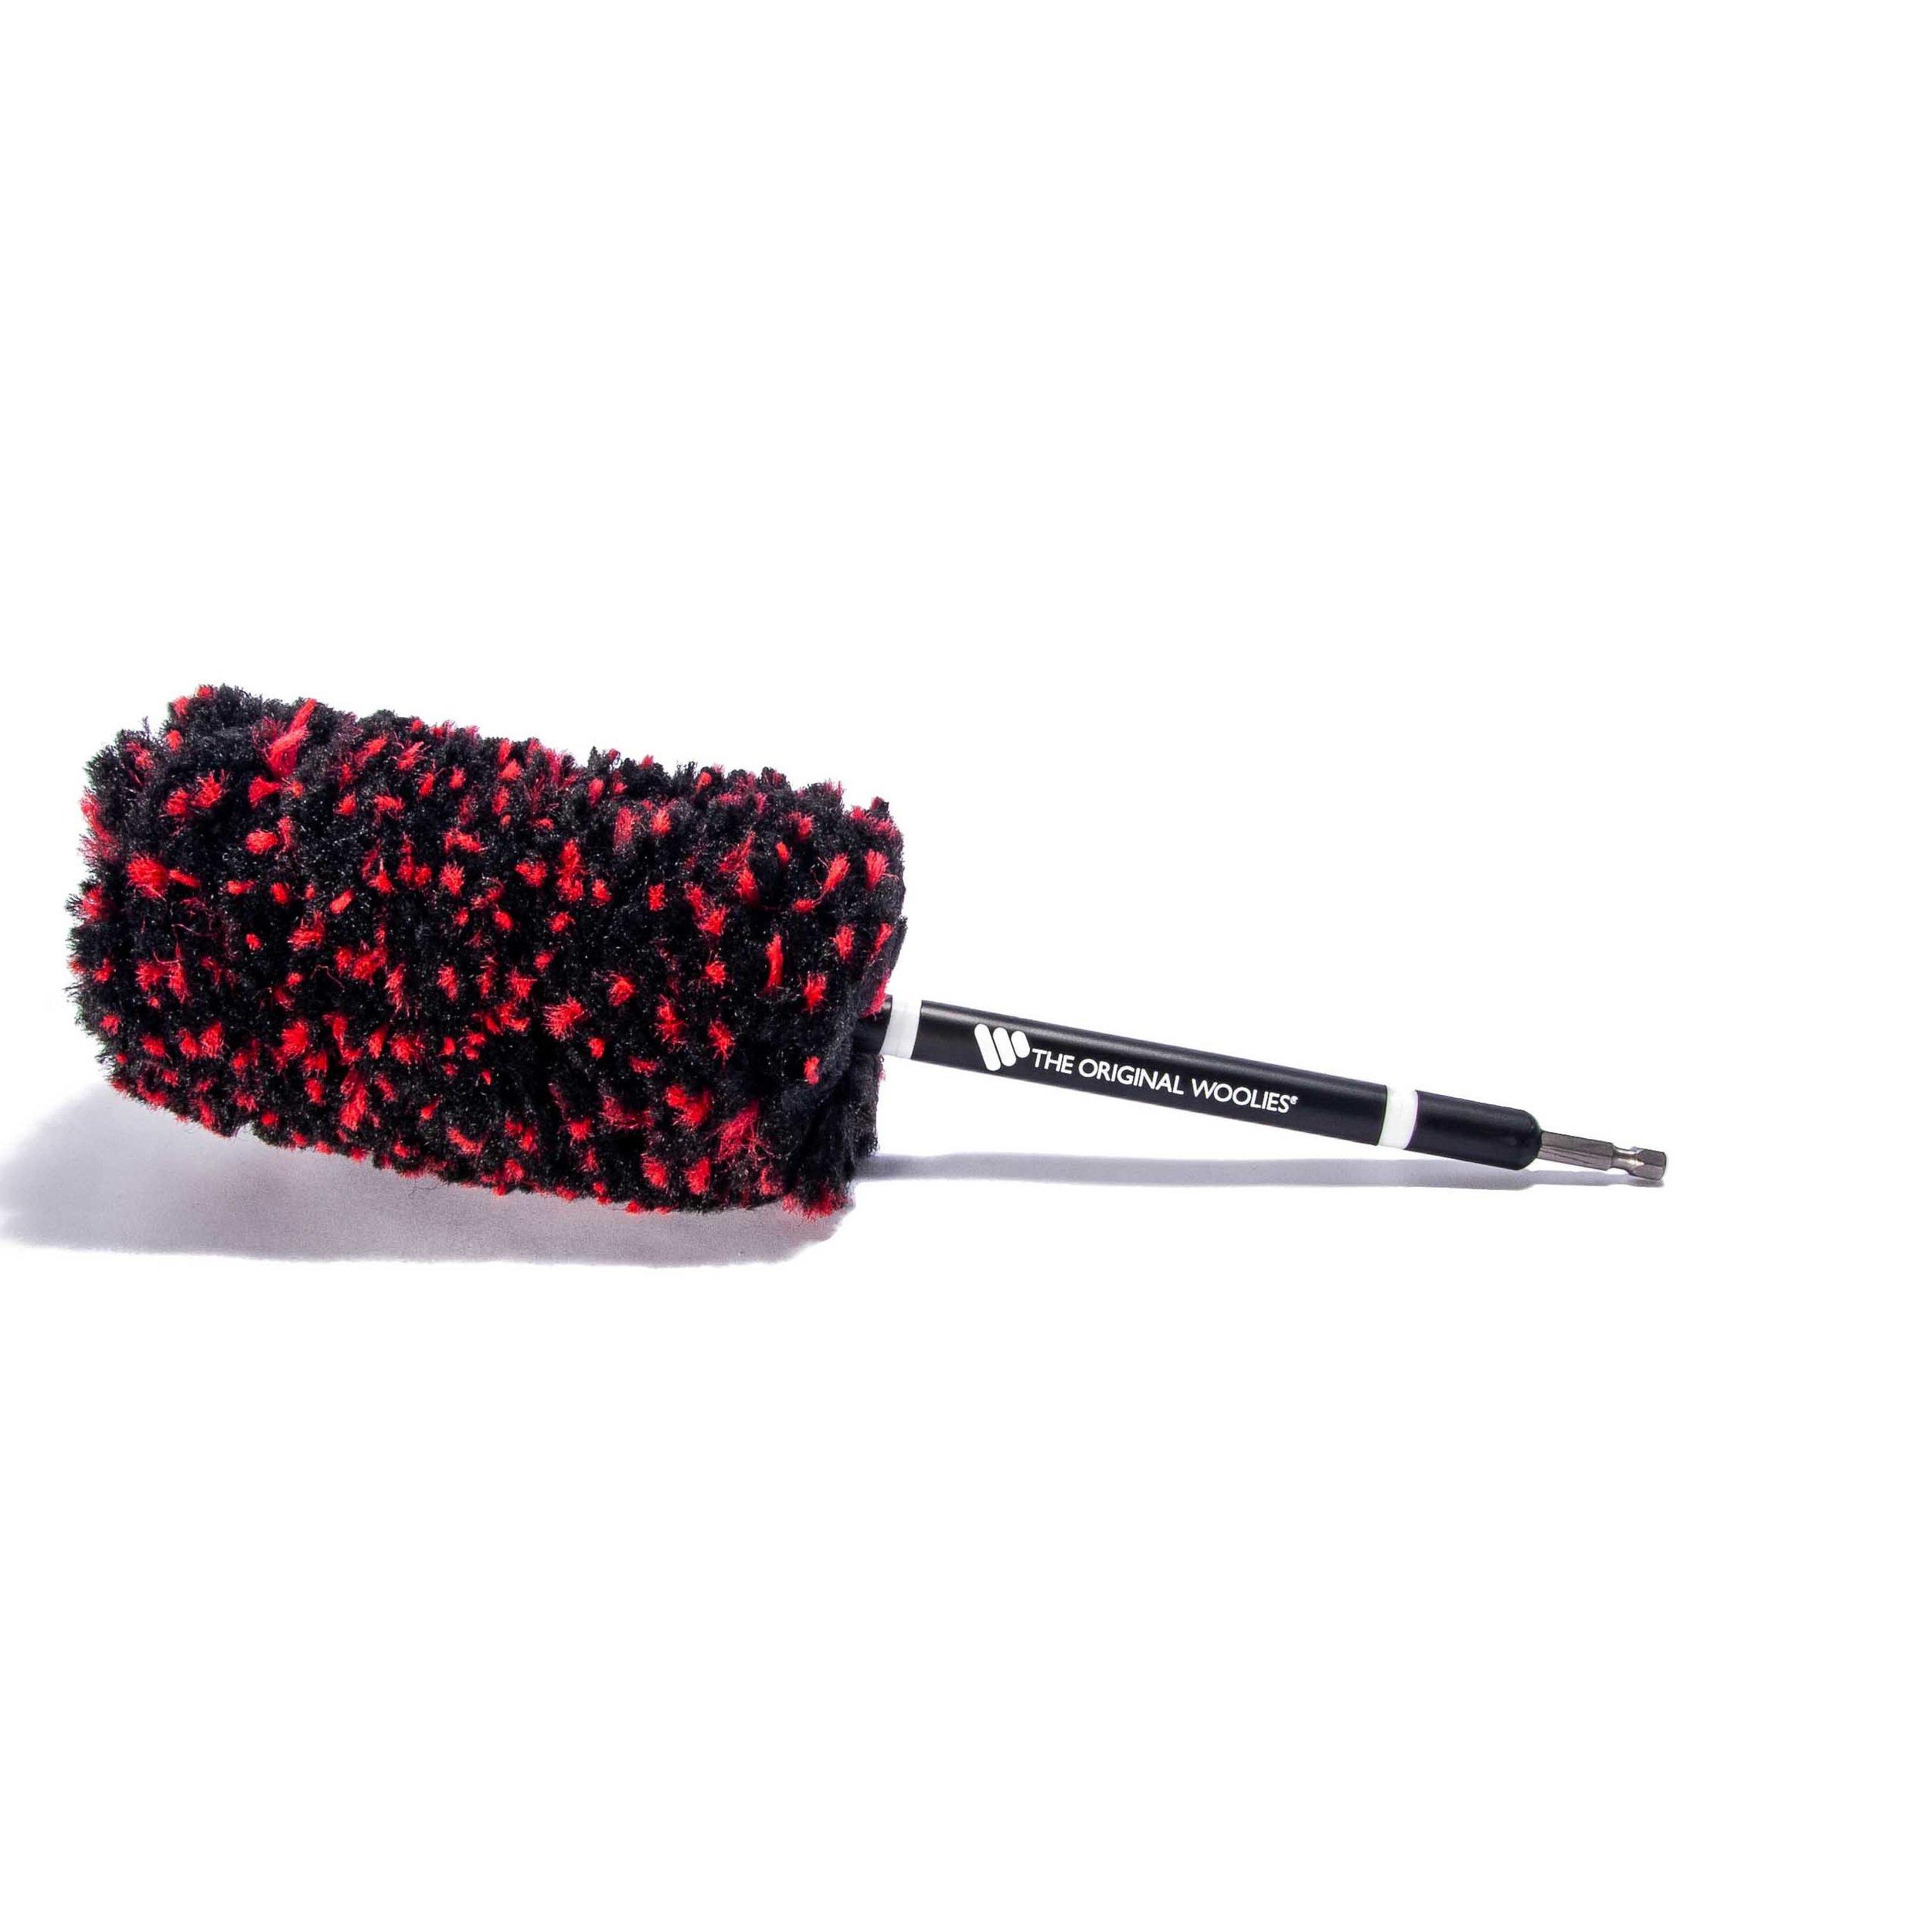 Wheel Woolies® 3 pack Red Grip Detailing brush kit Large Medium and Small